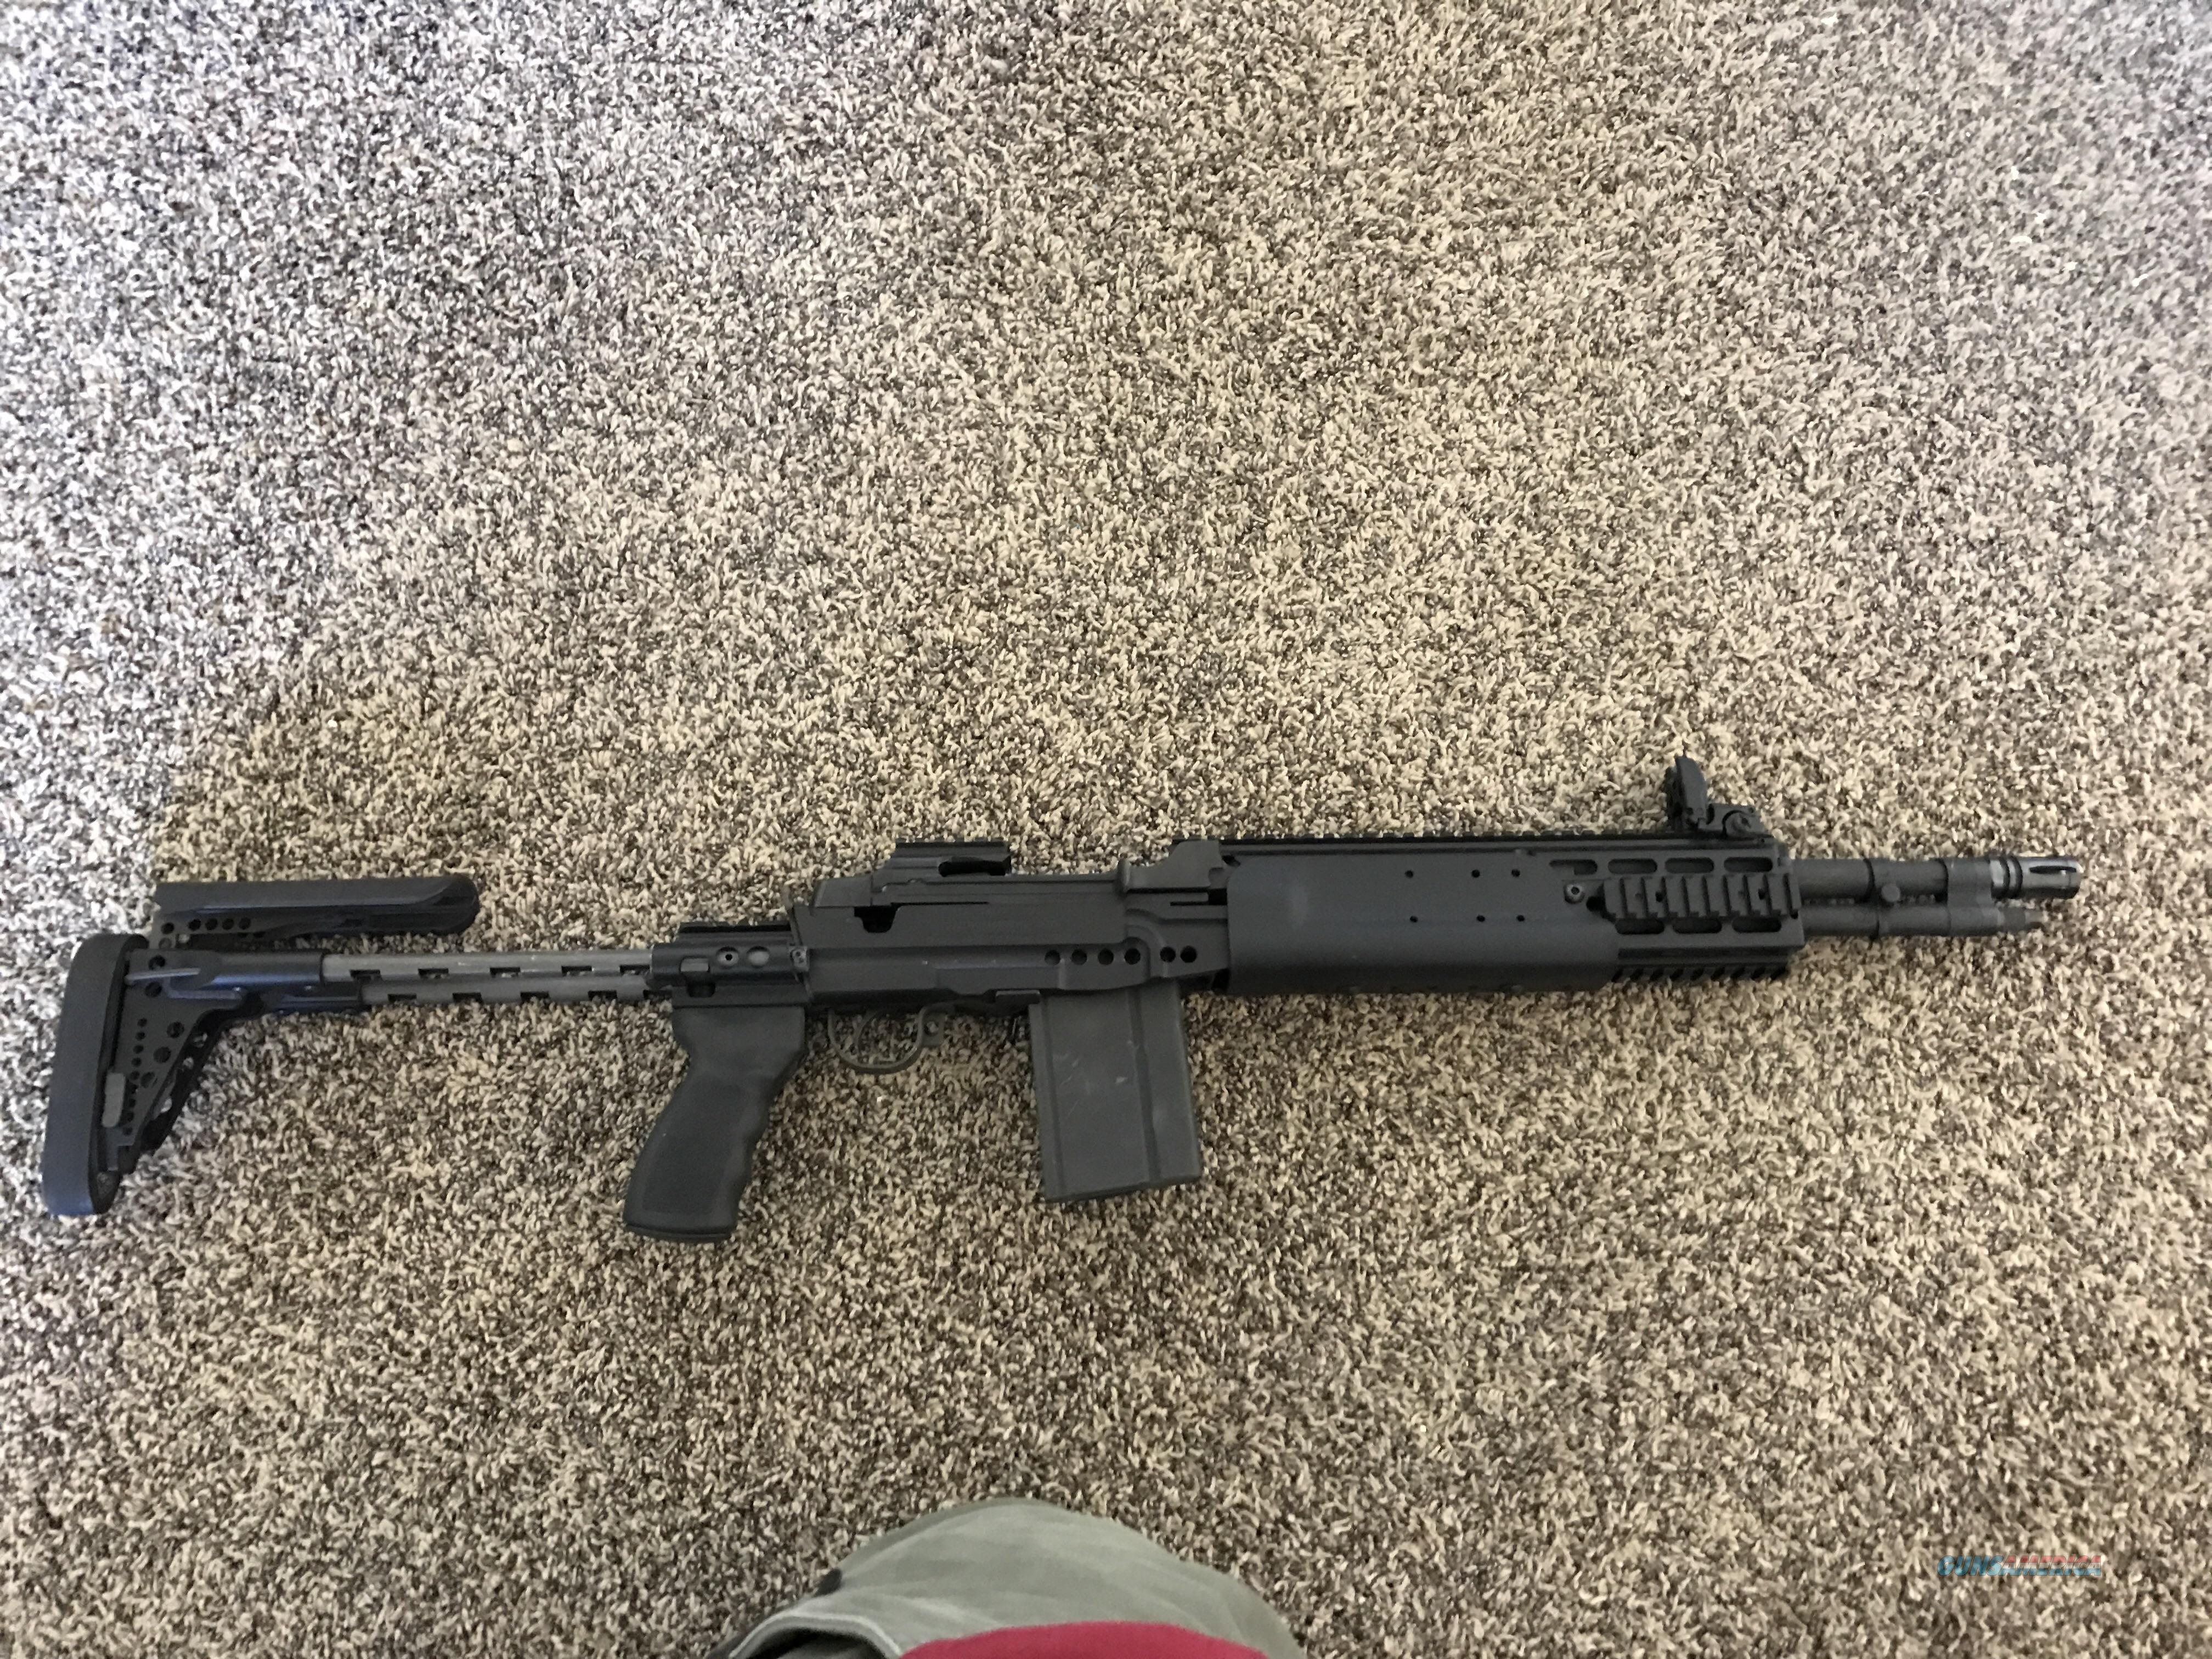 M1A bula defense xm21 sage ebr